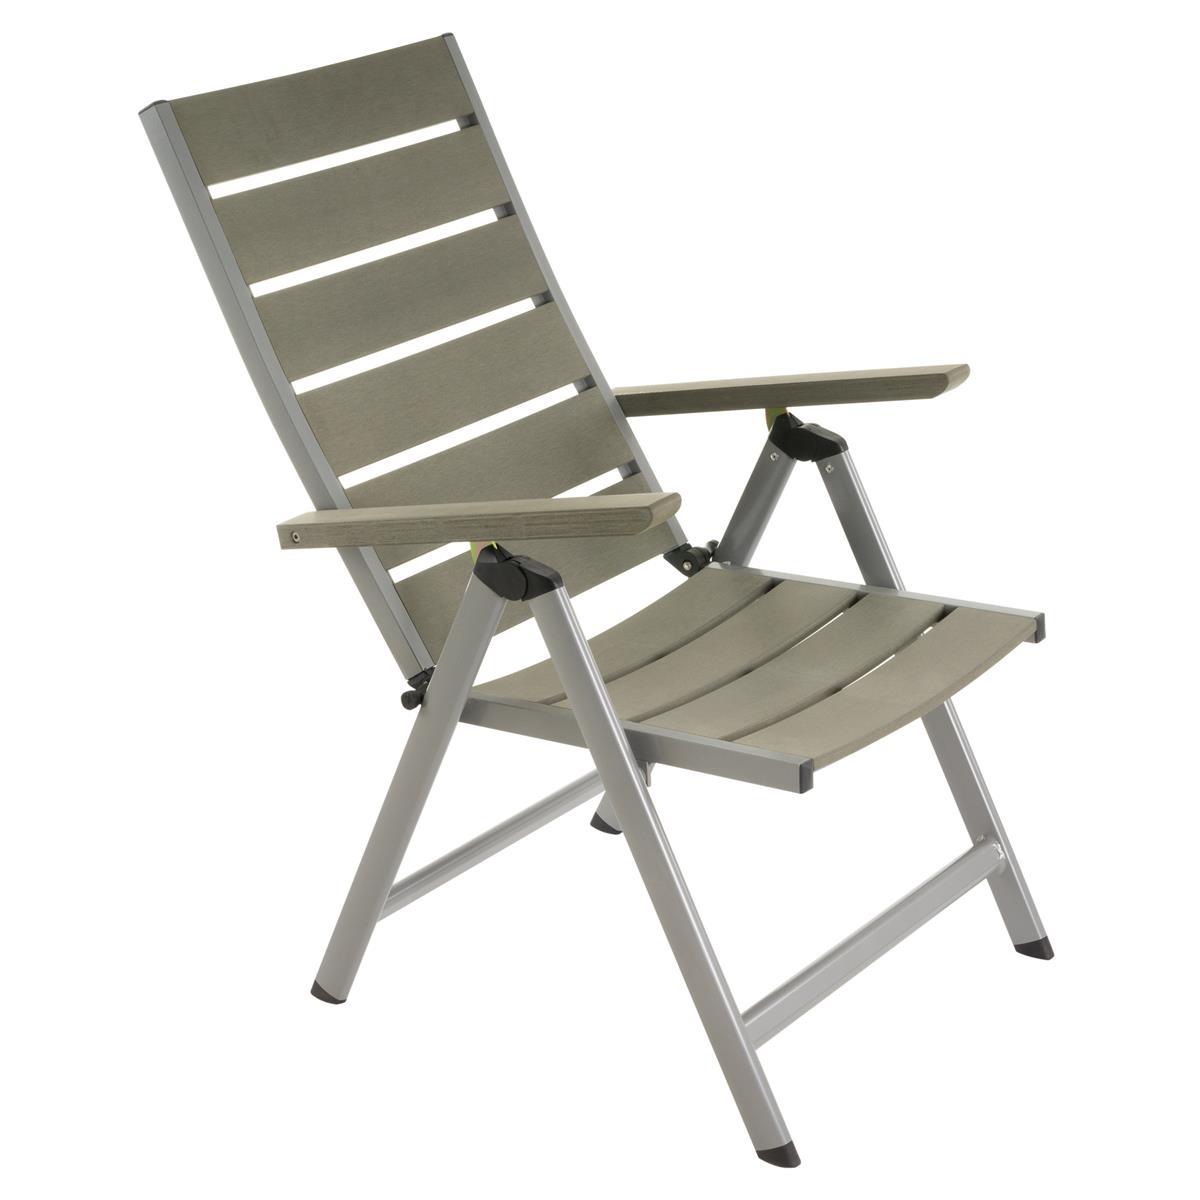 Gartenstuhl Klappstuhl grau klappbar Aluminium Polywood Hochlehner Klappsessel